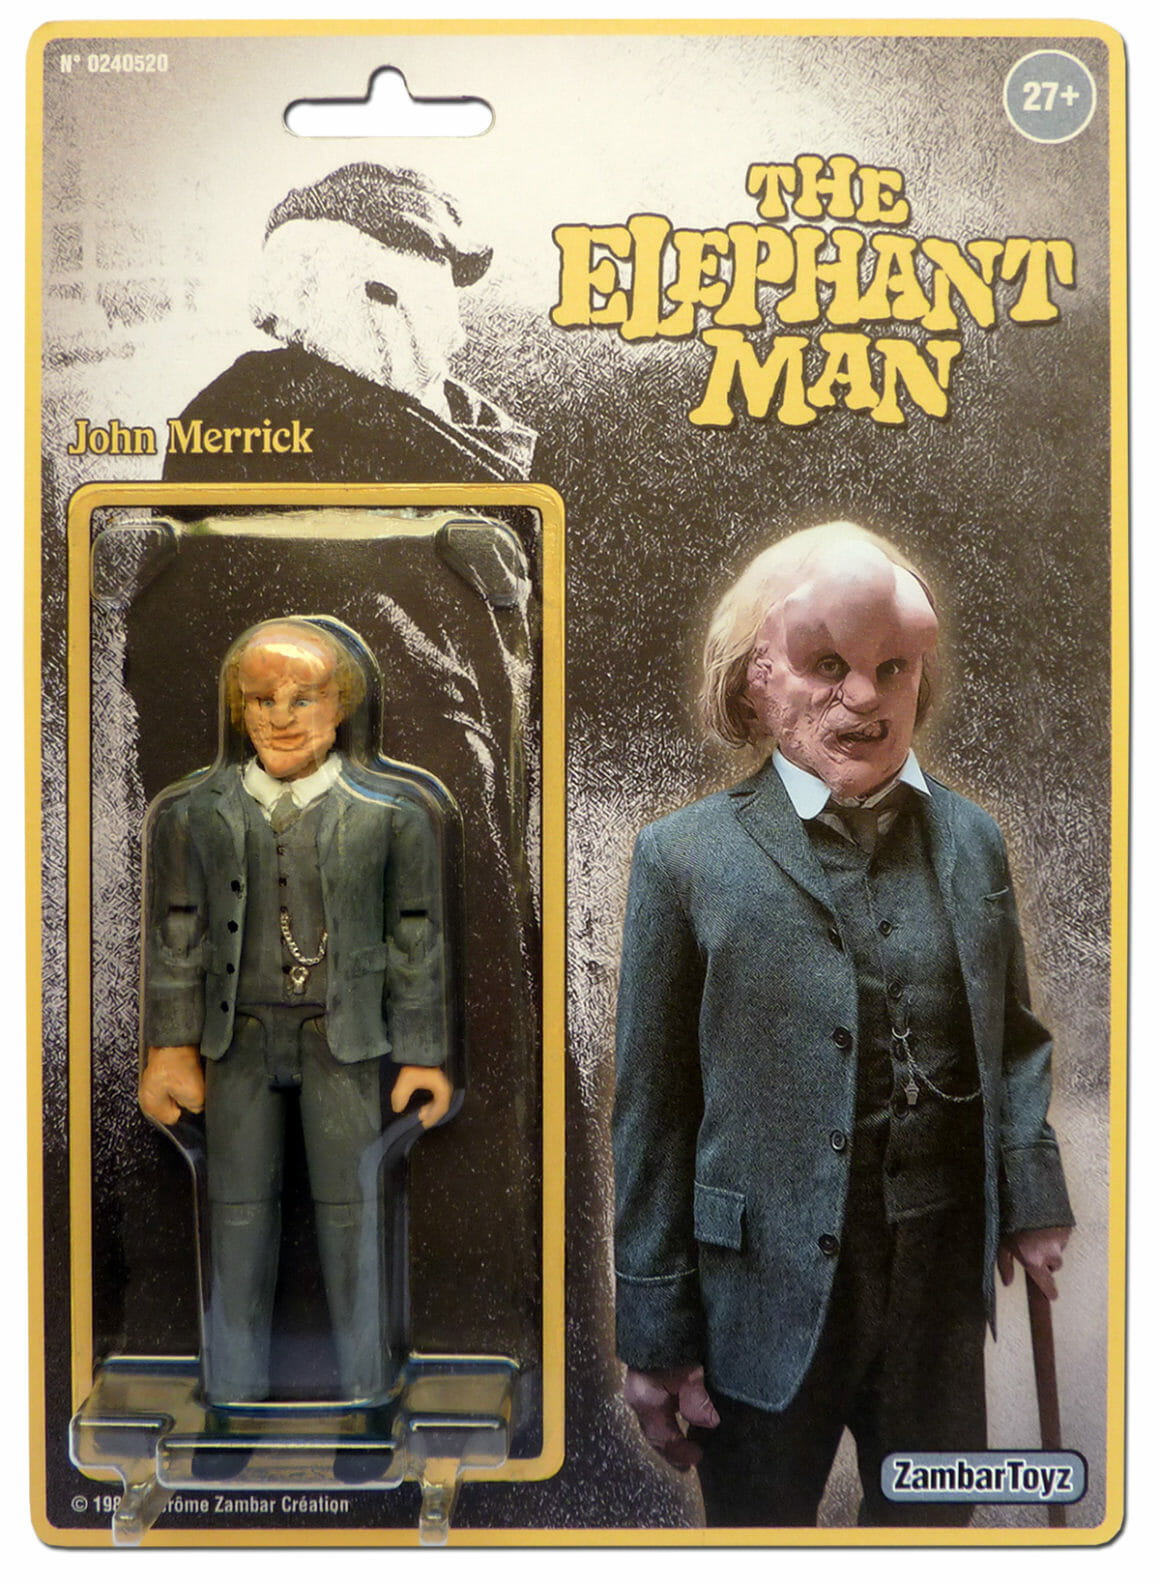 Zambar Toyz elephant man